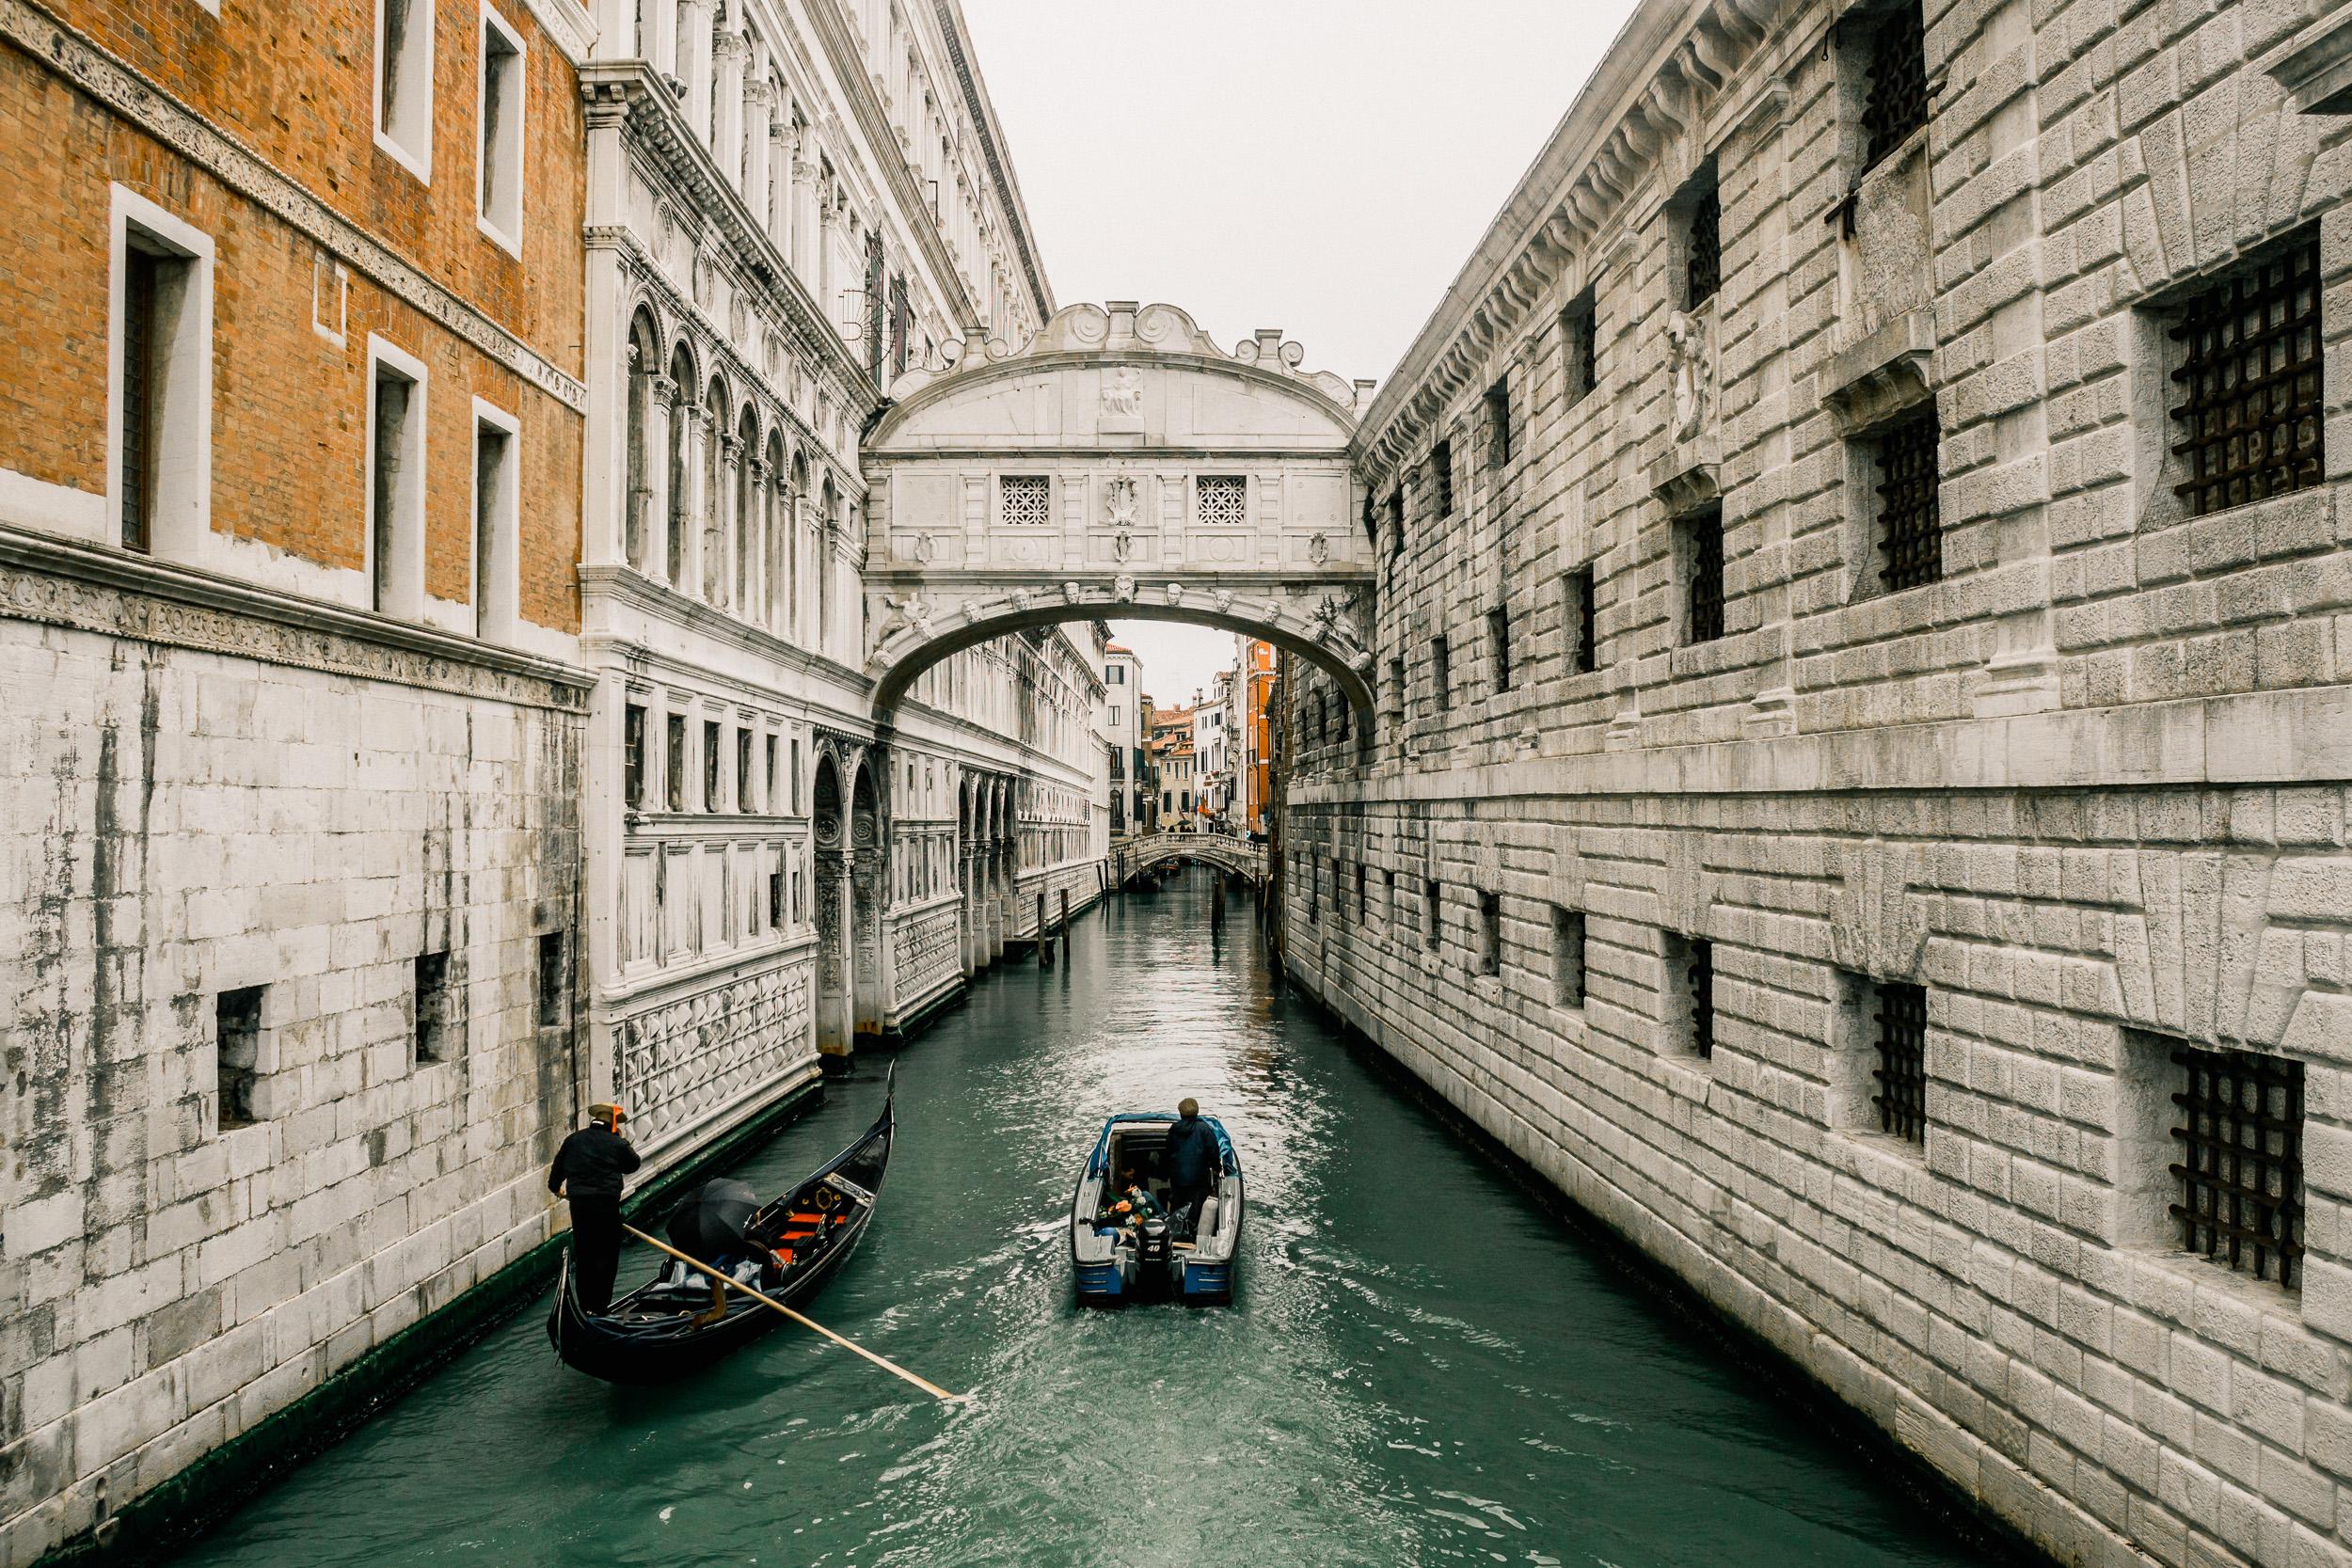 34-venice-italy-bridge-of-sighs-gondola-canal-anna-elina-lahti-photographer.jpg